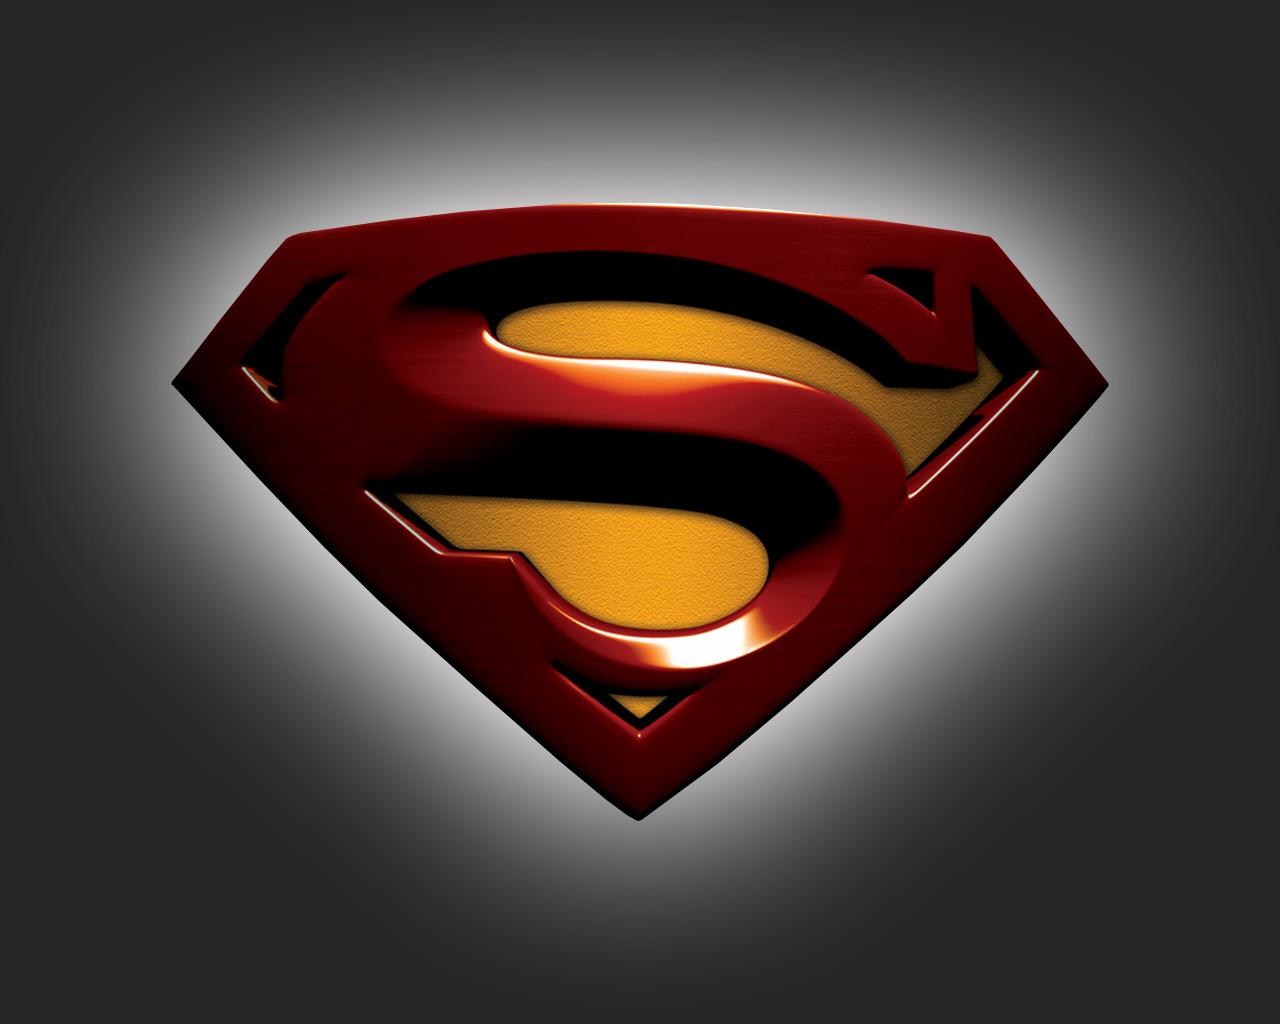 superman wallpaper geni ekran masa superman wallpaper hd waka 2 1280x1024